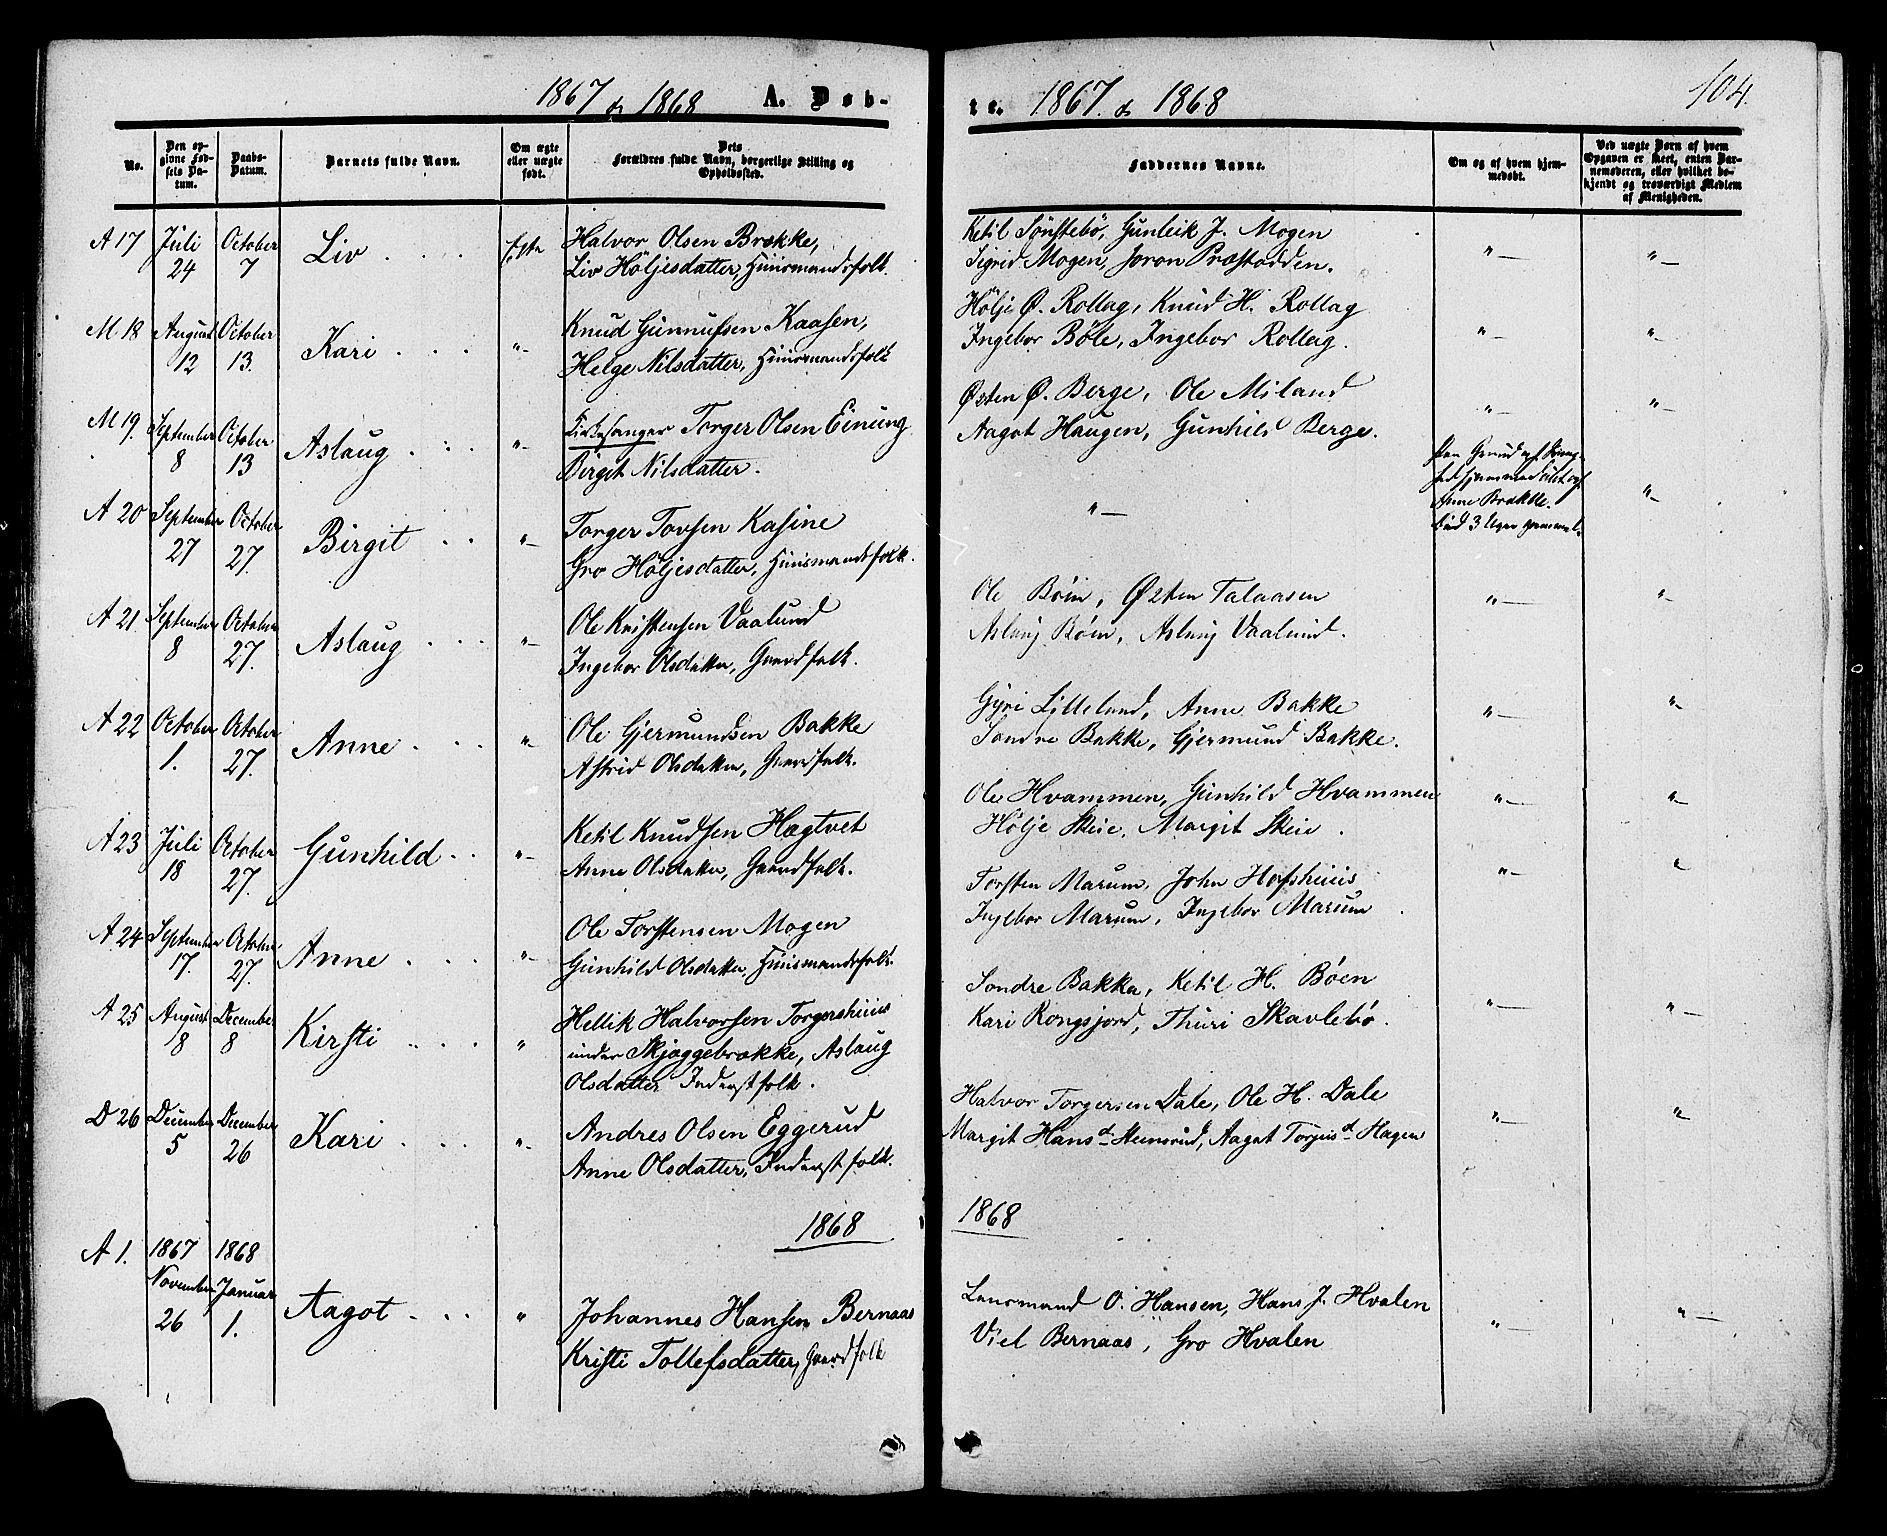 SAKO, Tinn kirkebøker, F/Fa/L0006: Ministerialbok nr. I 6, 1857-1878, s. 104